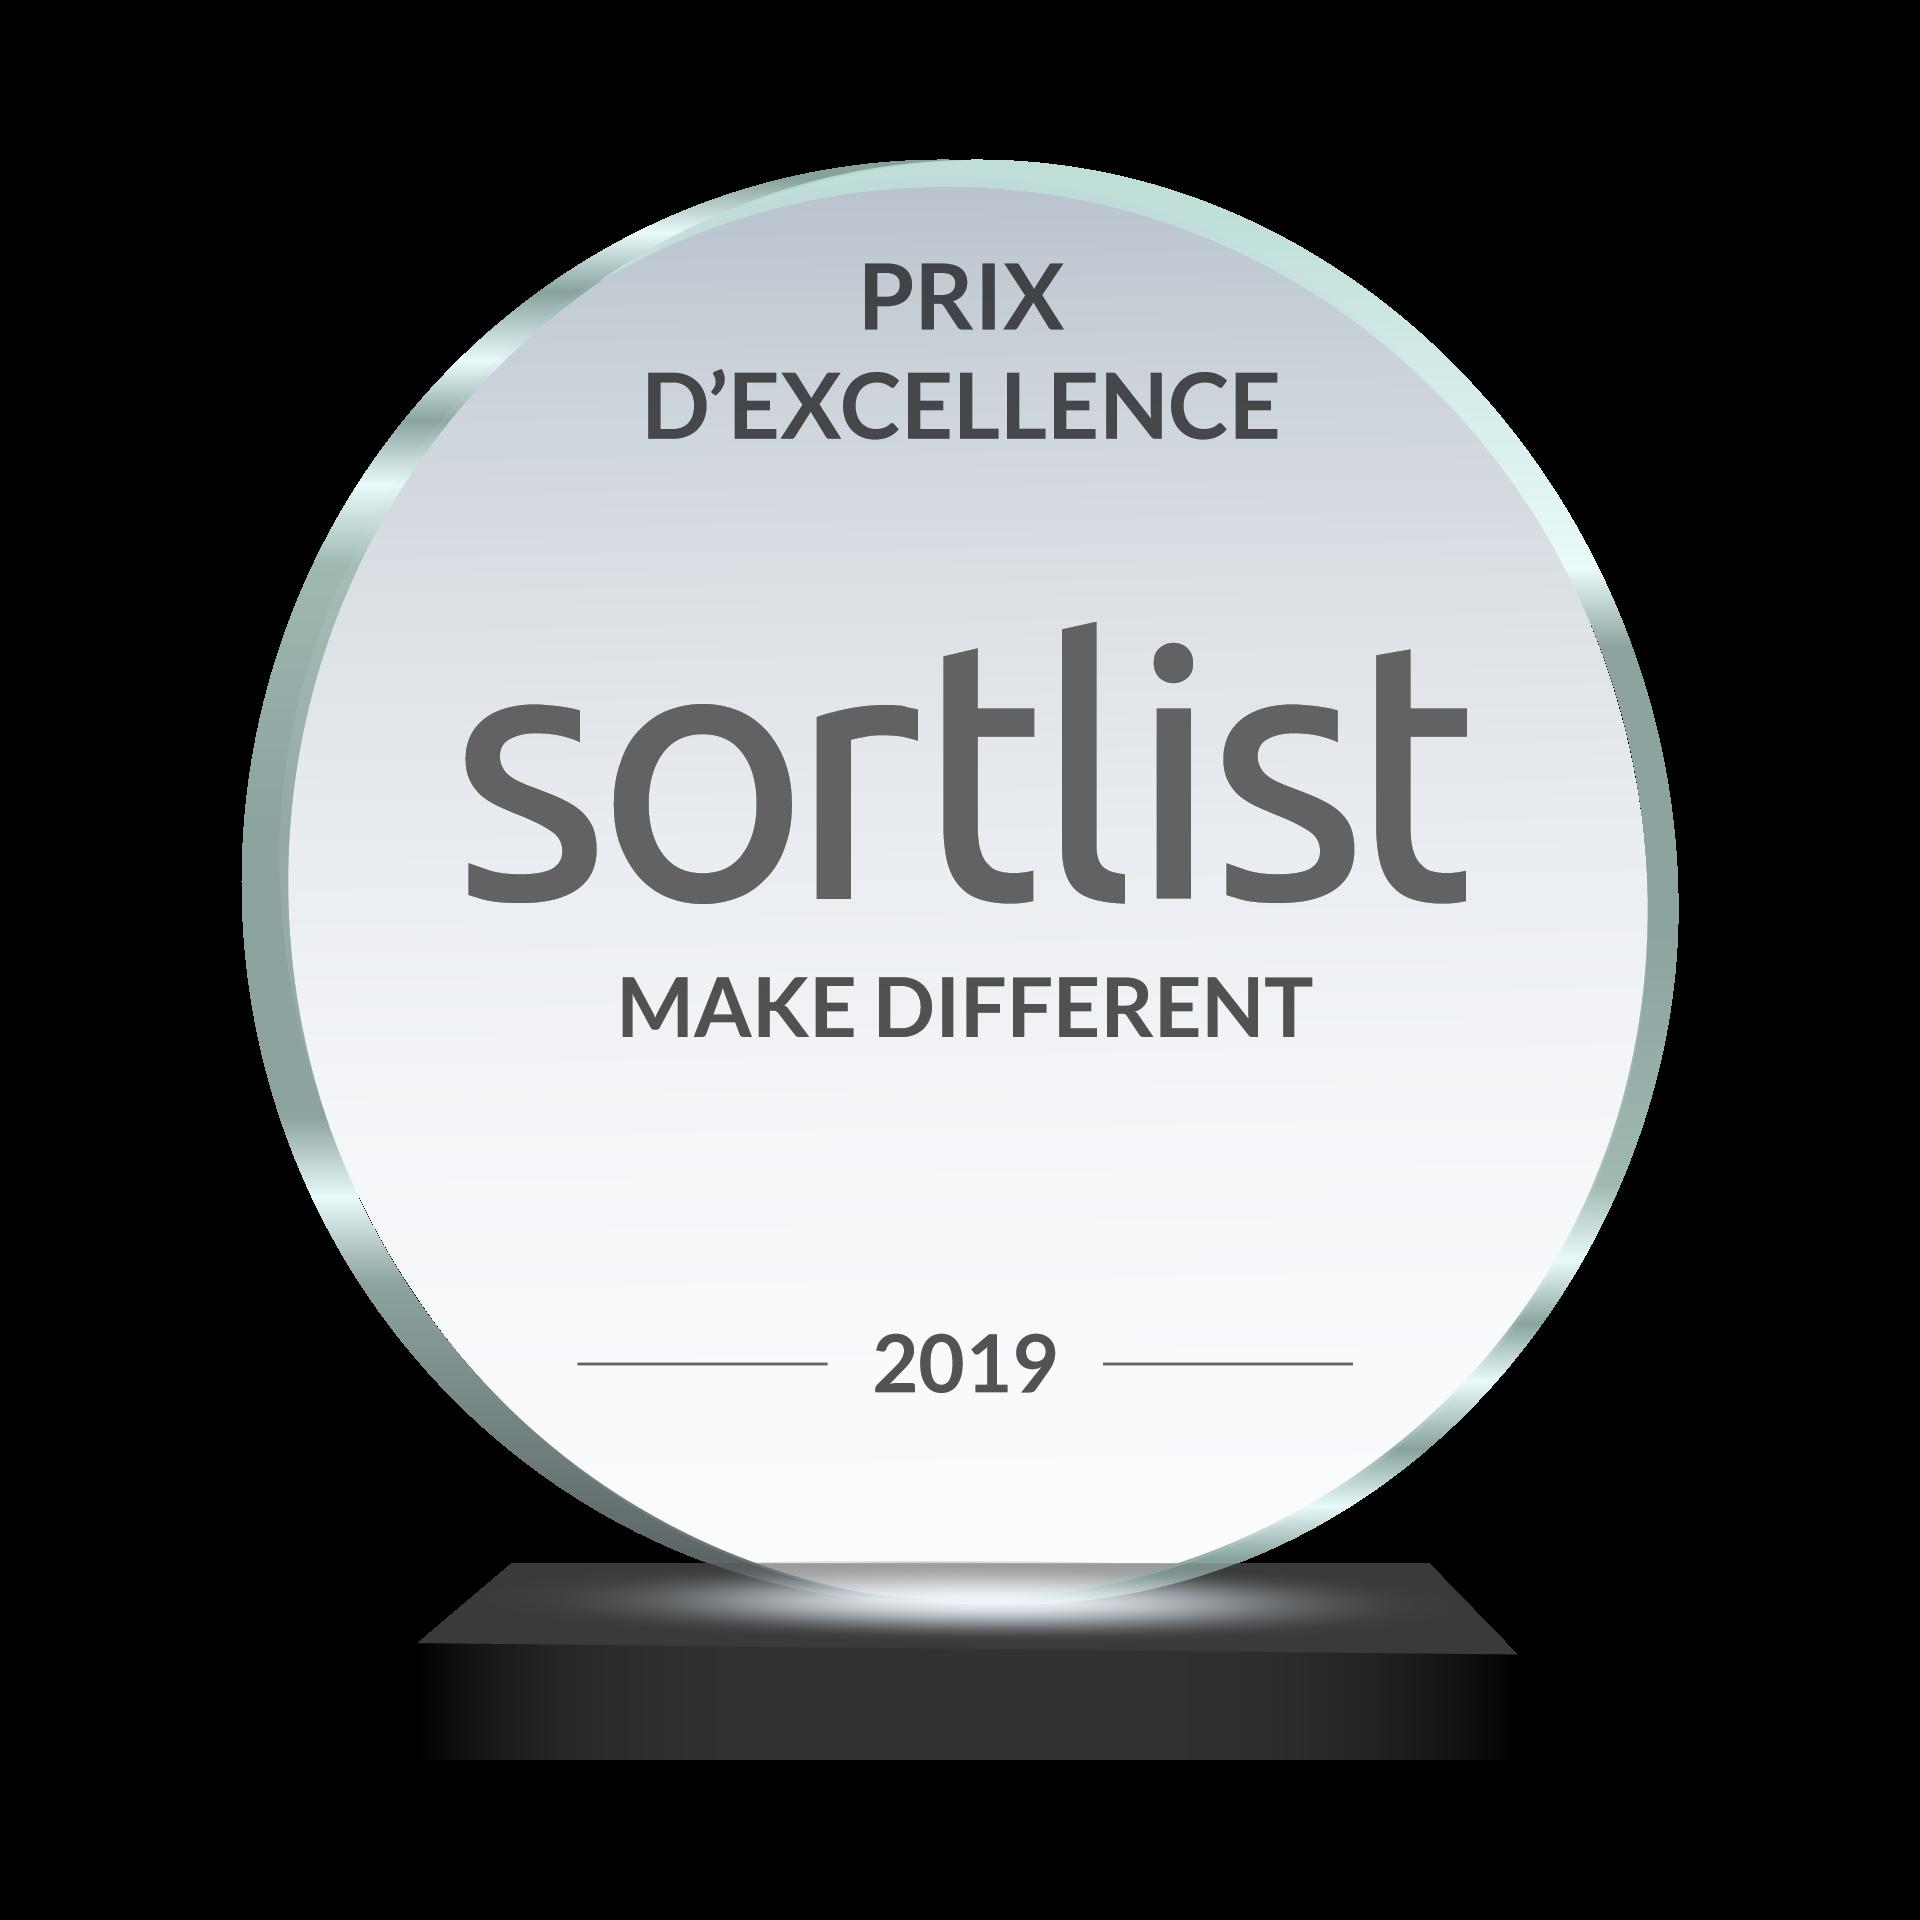 prix-excellence-sortlist-2019-make-different